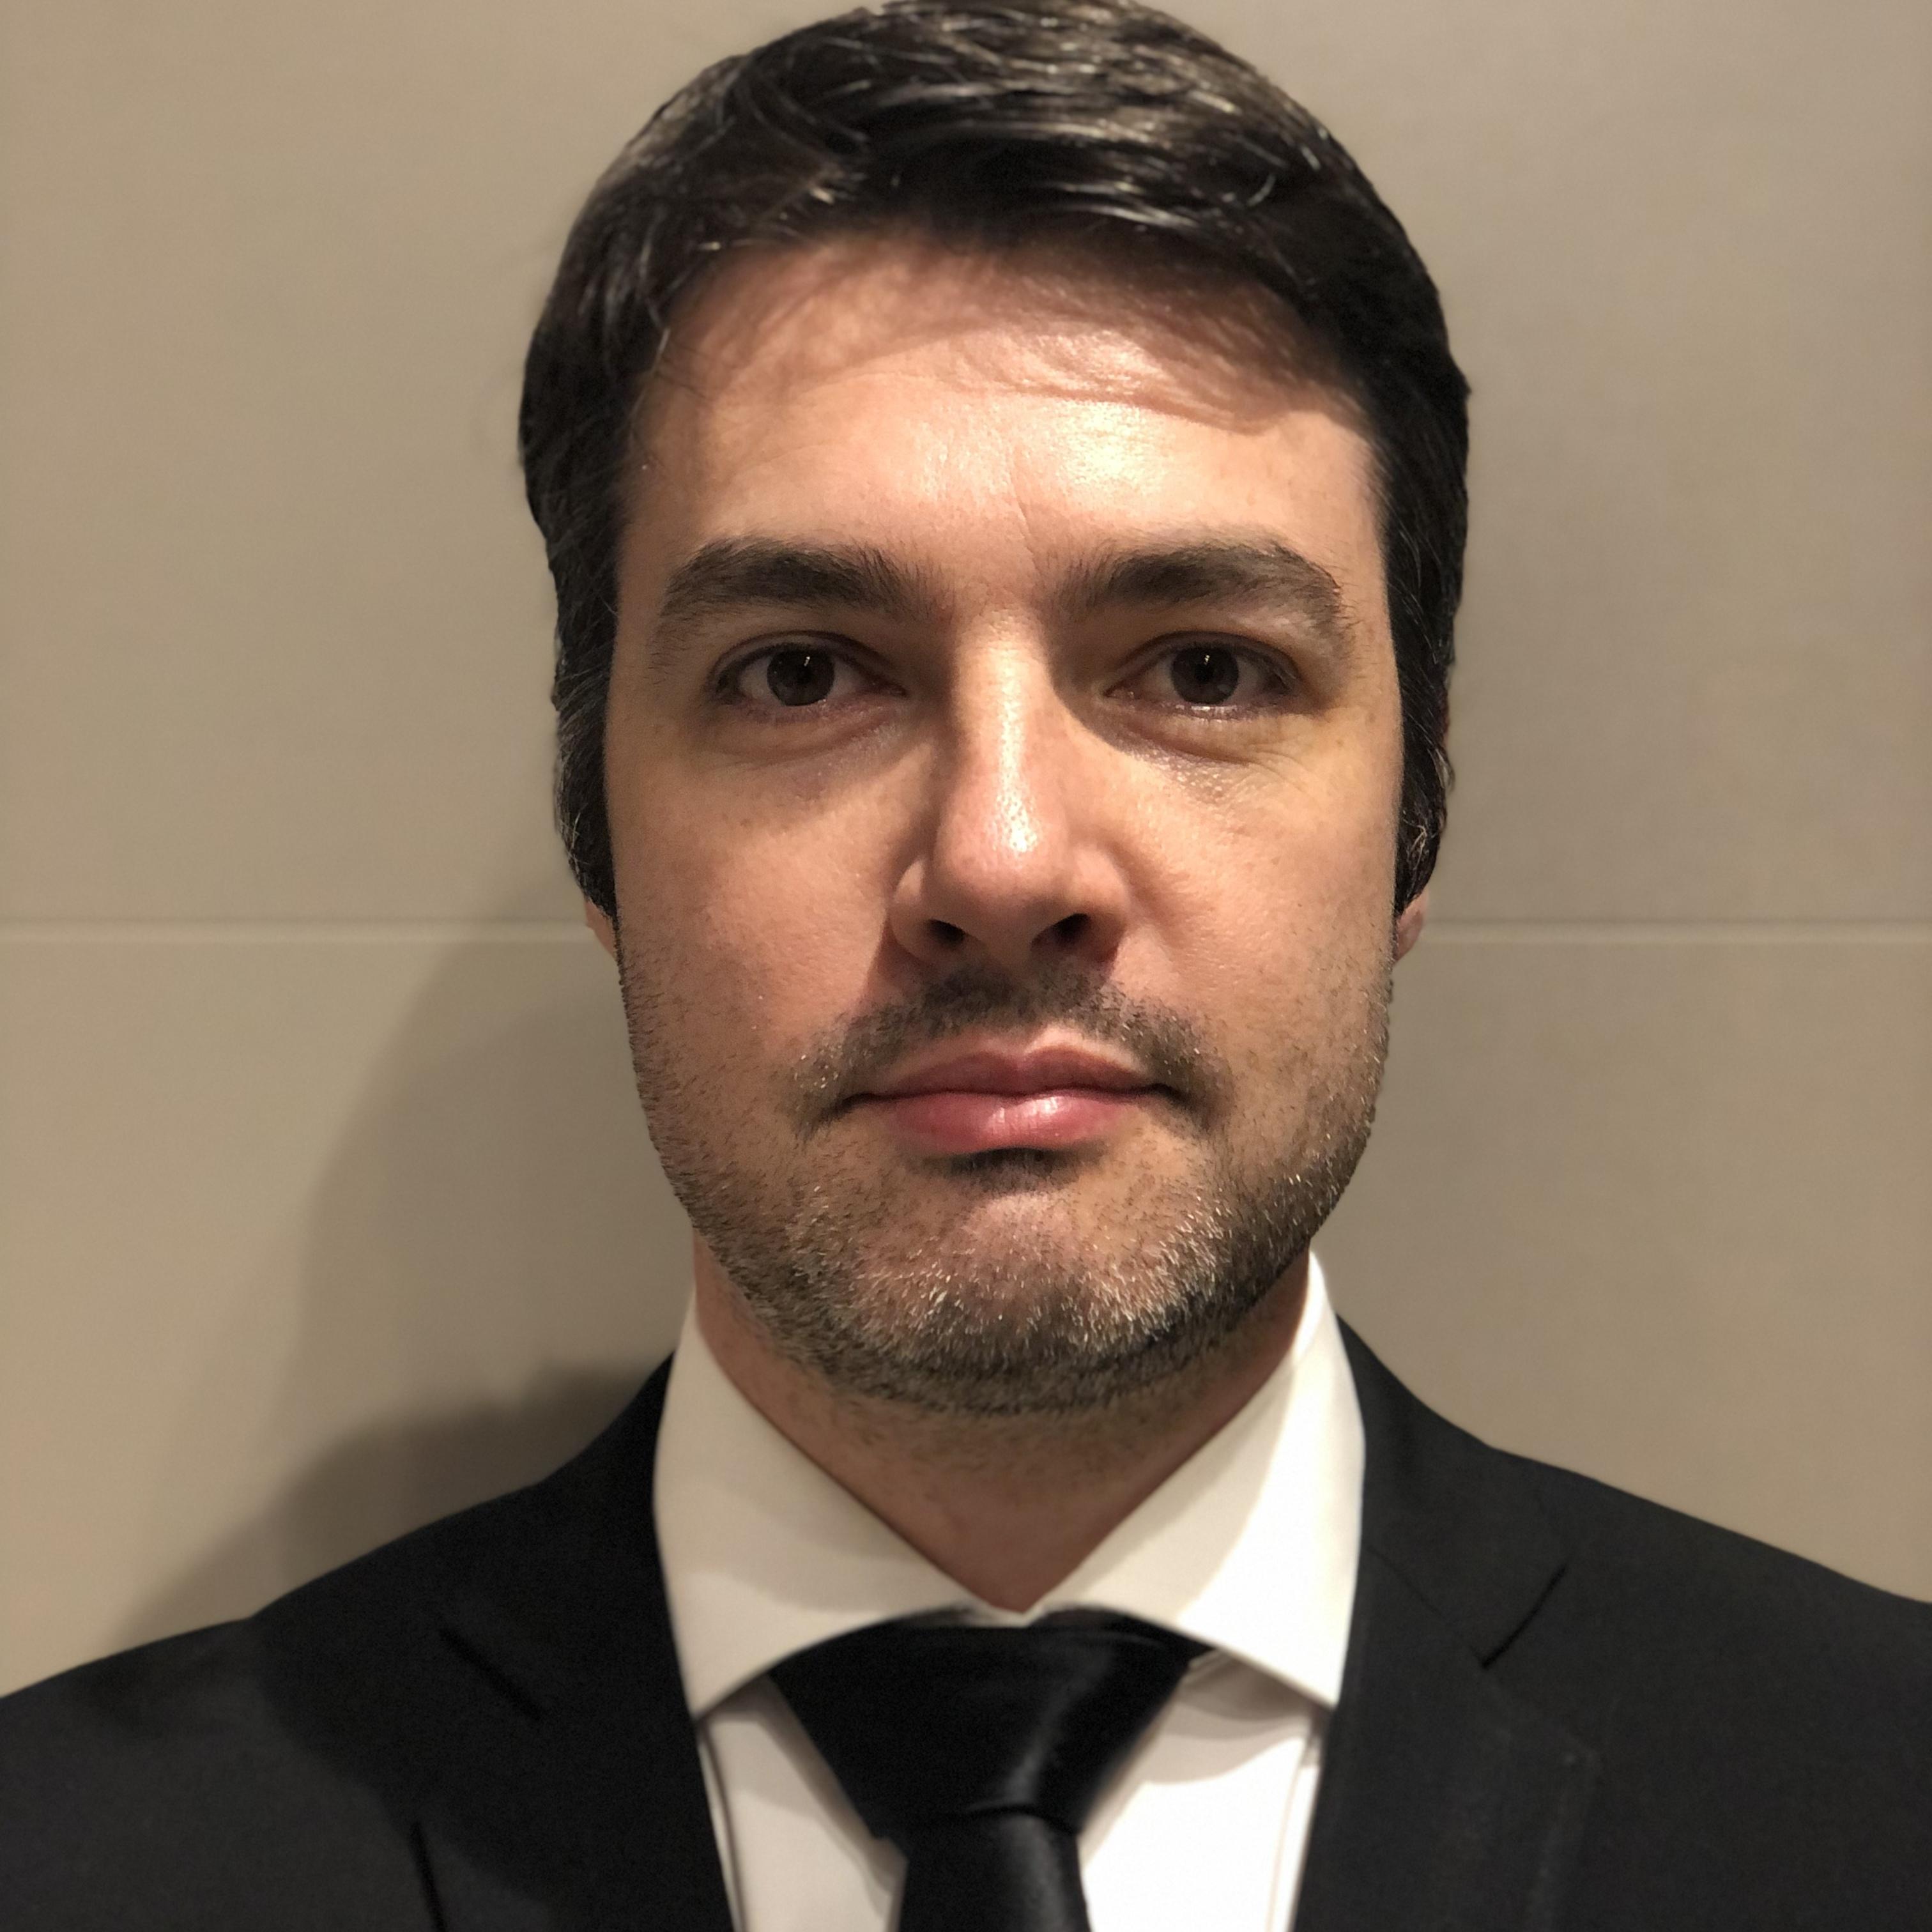 Juliano Fracasso